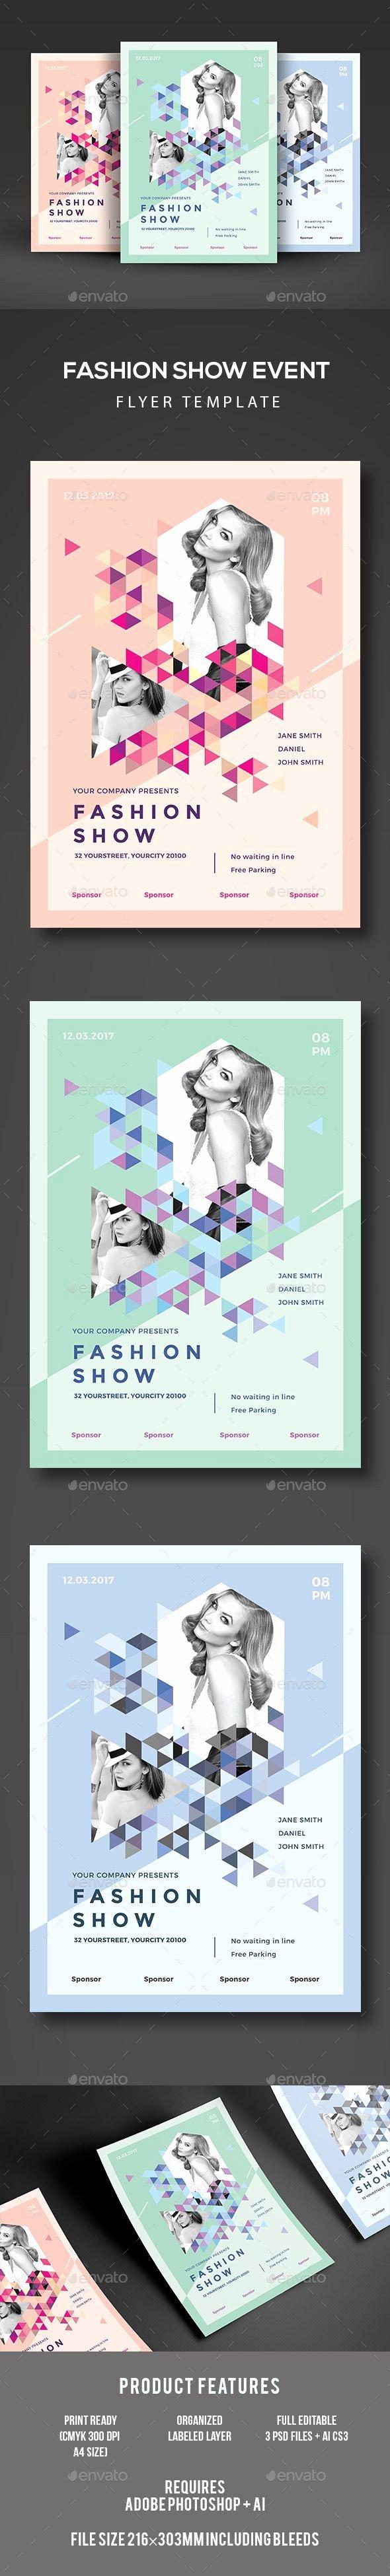 Fashion Show Invitations Templates Elegant 25 Best Ideas About Fashion Show Invitation On Pinterest